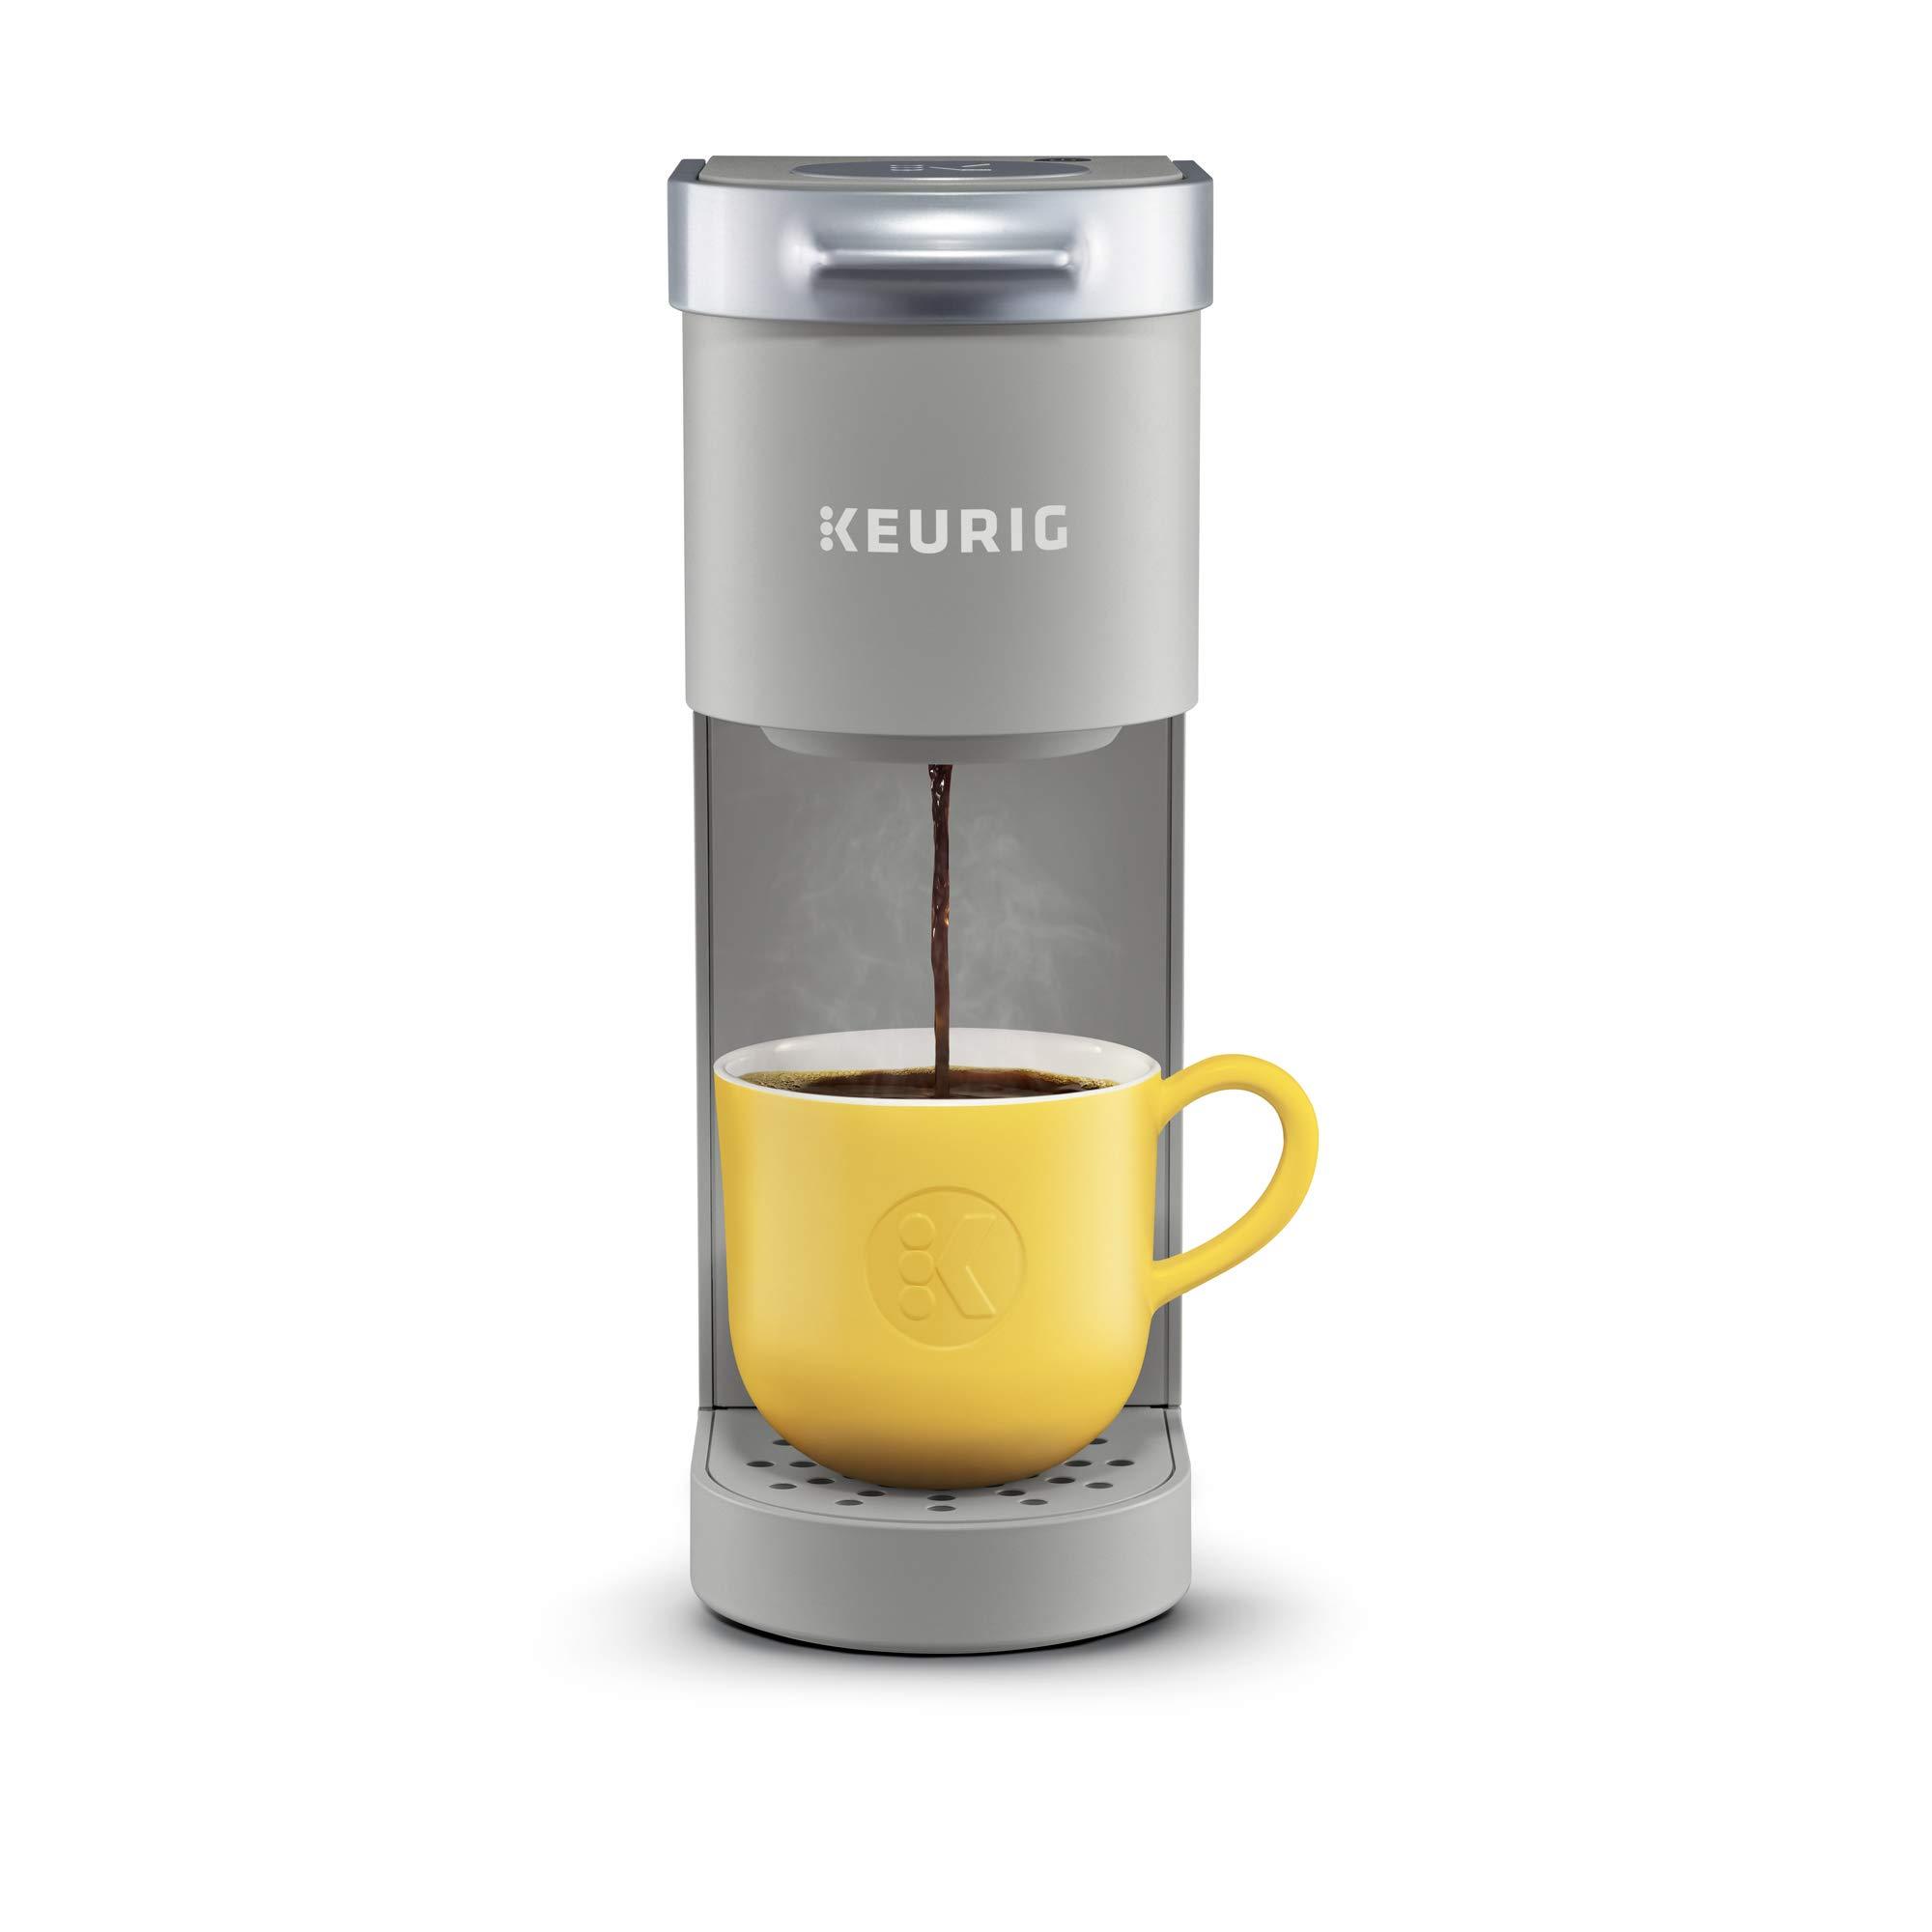 Keurig K-Mini Coffee Maker, Single Serve K-Cup Pod Coffee Brewer, 6 to 12 oz. Brew Sizes, Studio Gray by Keurig